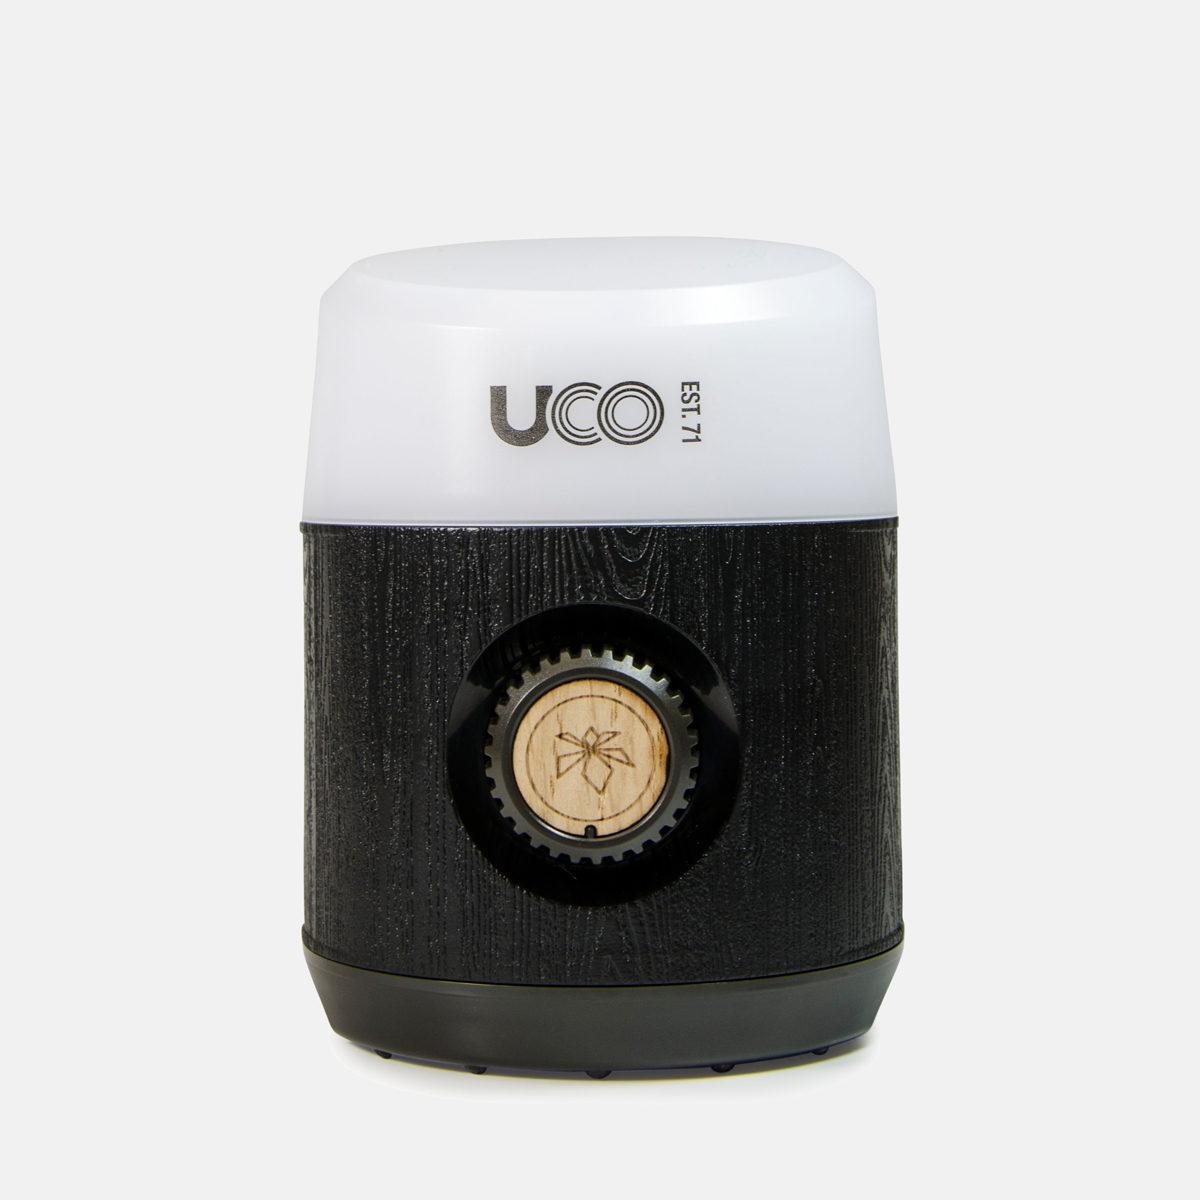 Uppladdningsbar campinglykta & USB-powerbank